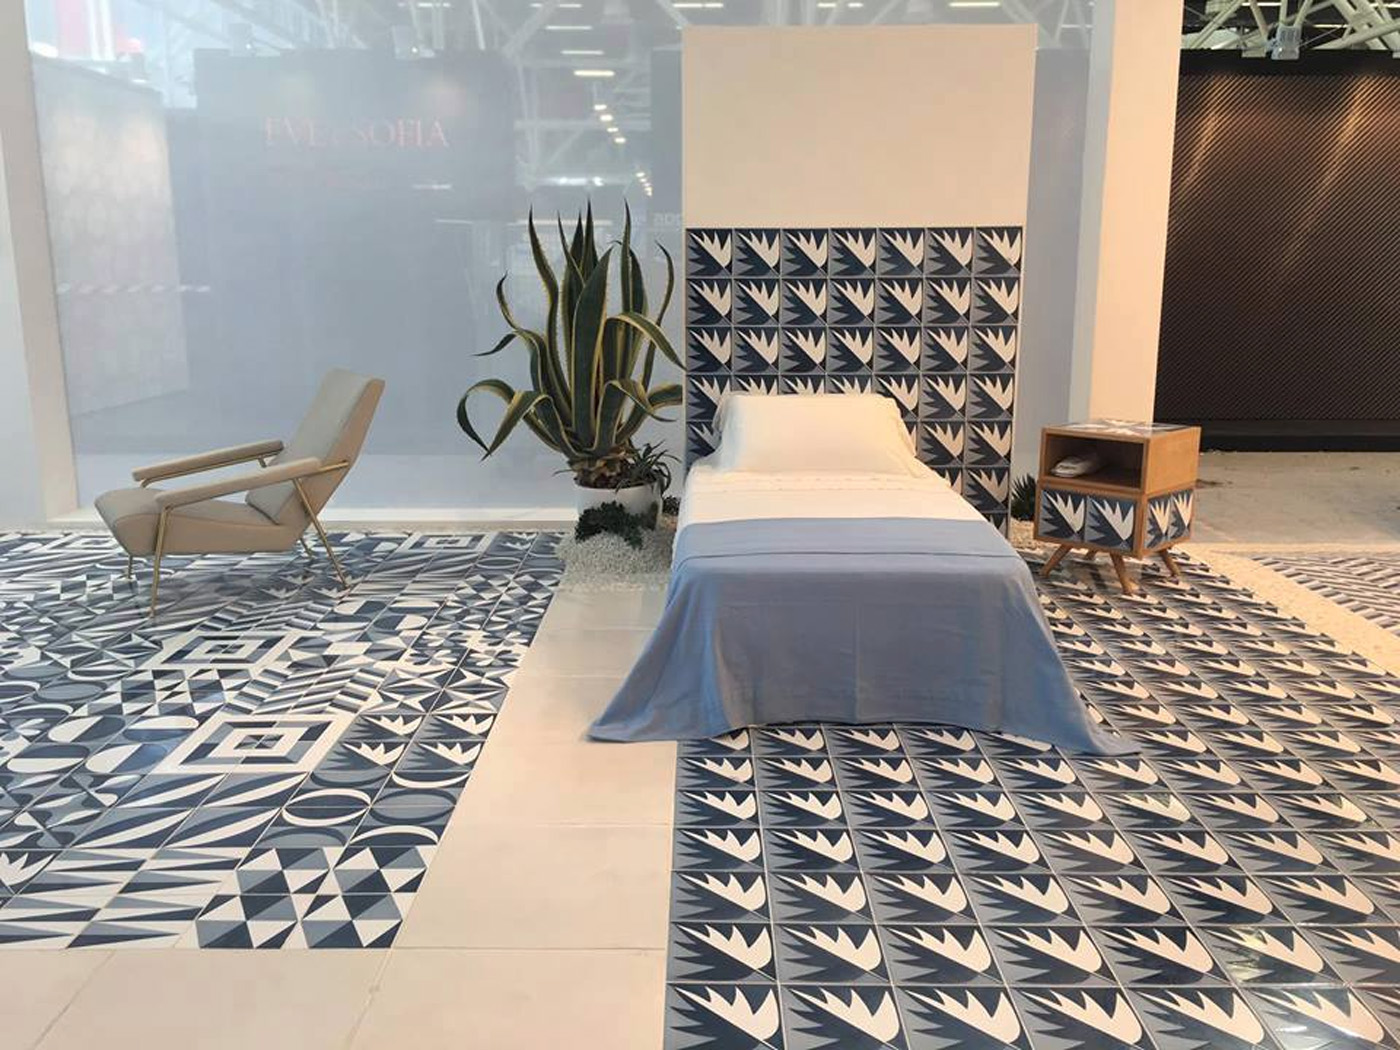 Crea idea casa gio ponti ceramica francesco de maio l - Gio ponti piastrelle ...